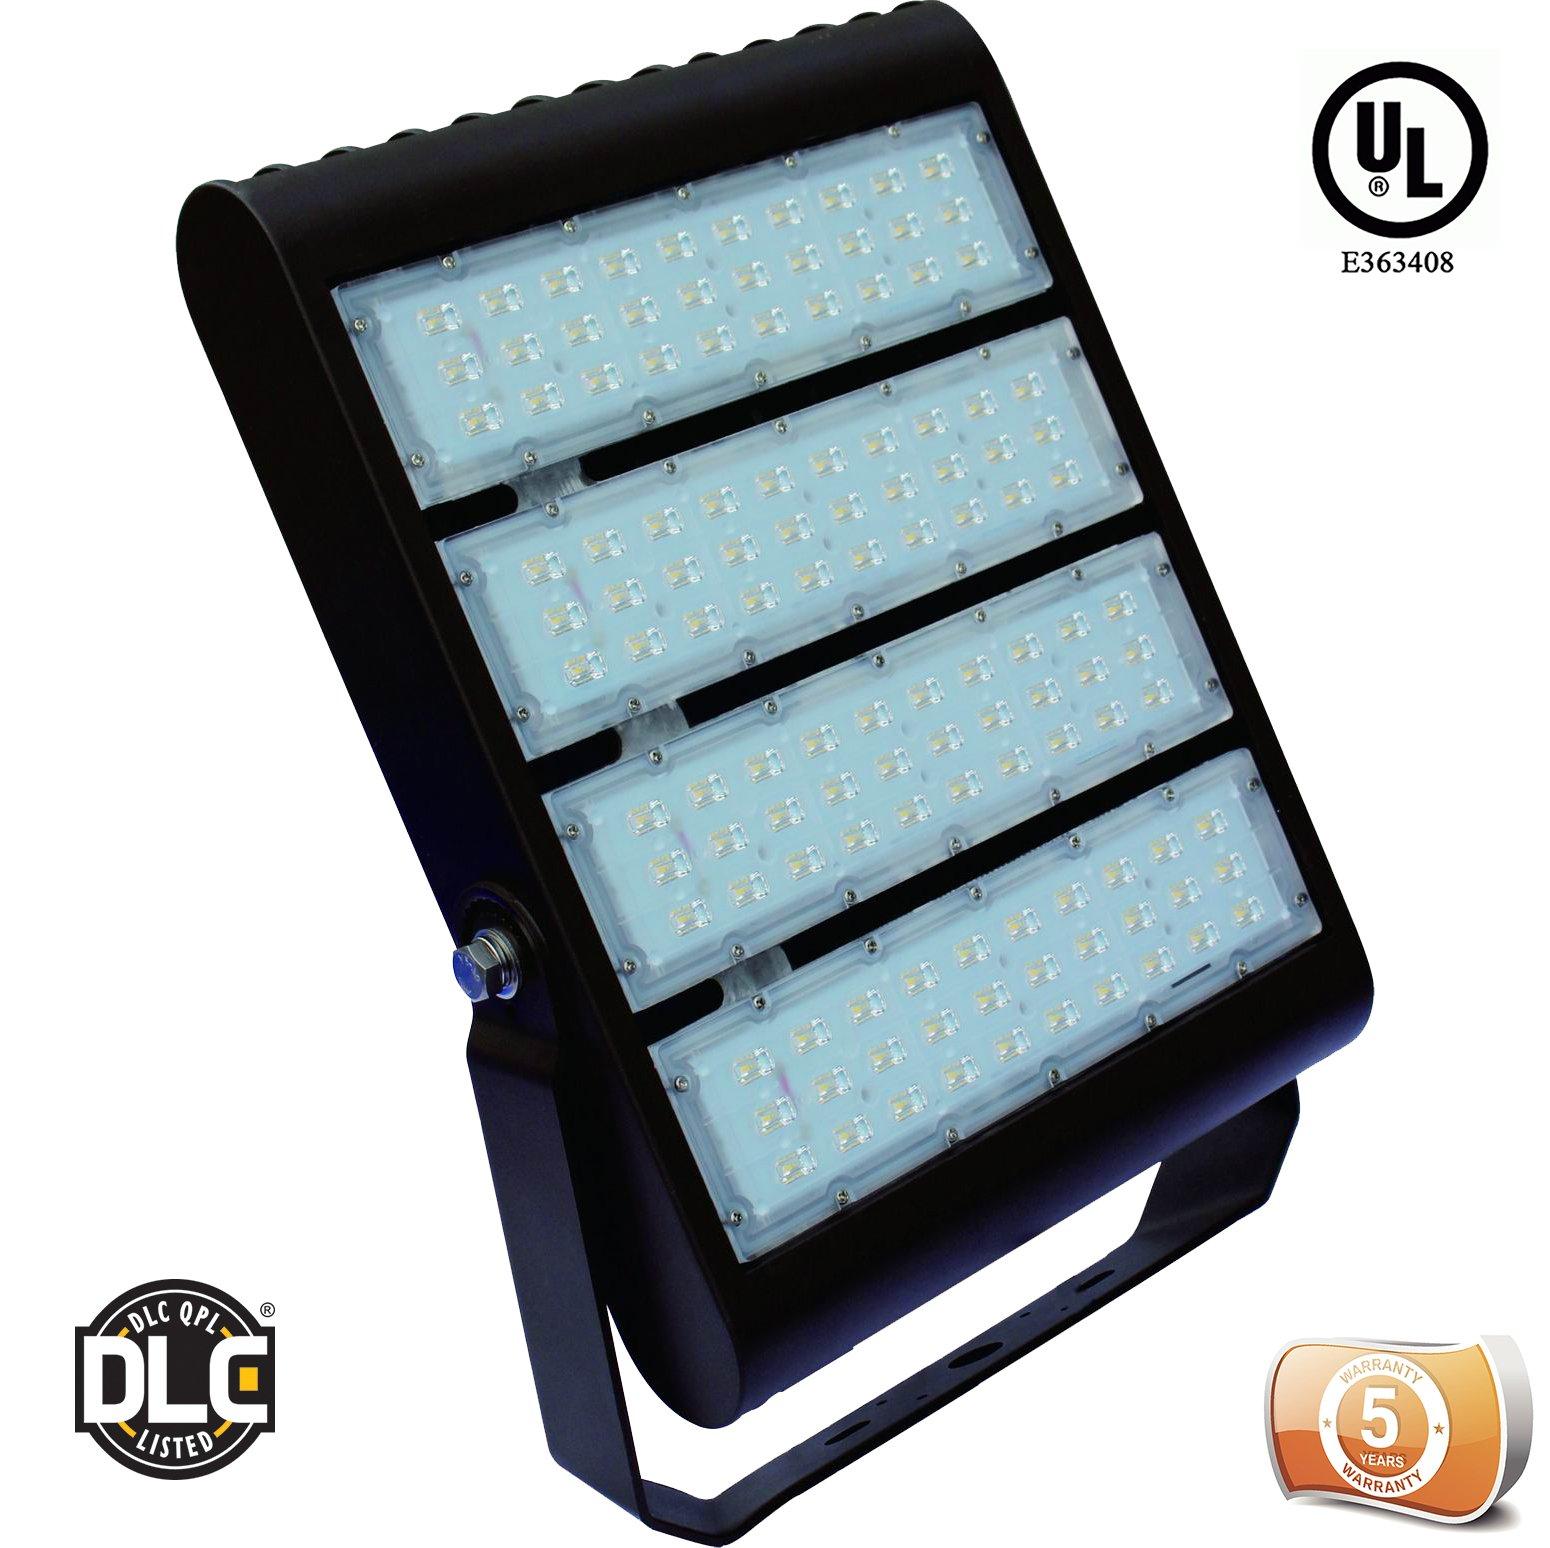 DLC Listed LEDrock Electra Series 300 Watt LED Area Light, 4000K Neutral White, 120V-277V, Comparable to 1,000W MH, 30,857 Lumens, Bracket Mount Area Light, UL, Warranty Based in Denver, CO, USA